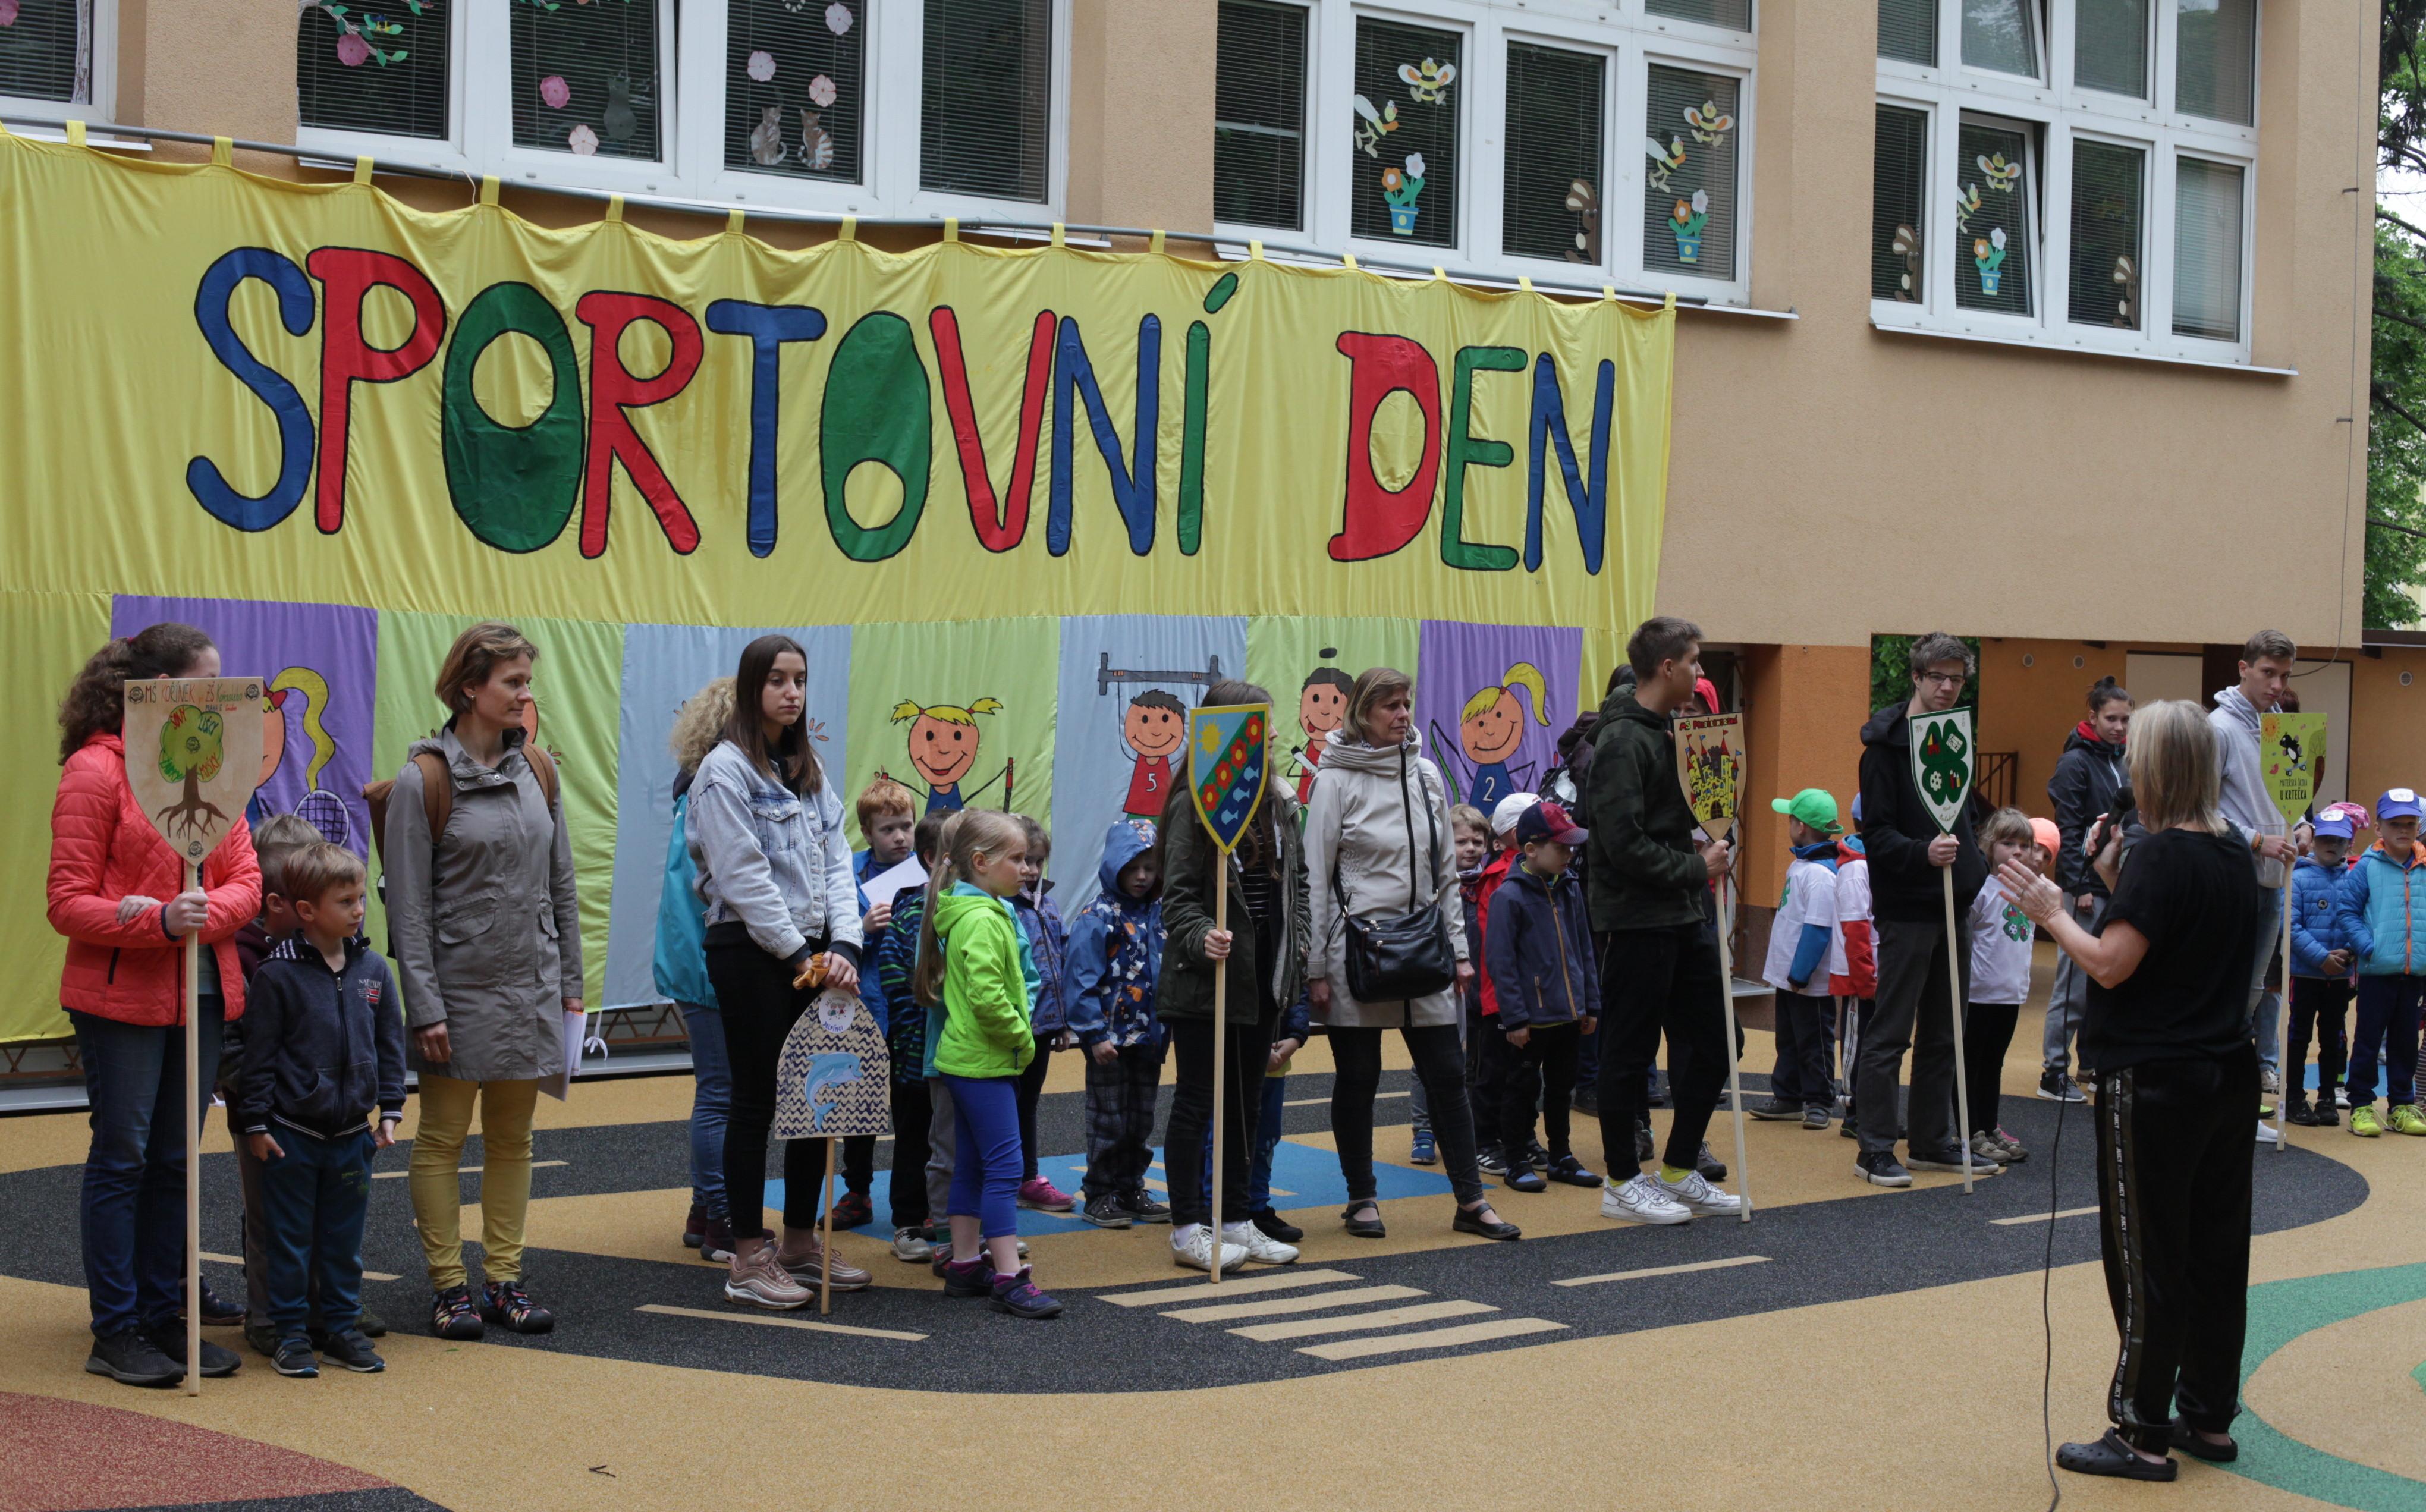 ms-podbelohorska-usporadala-sportovni-den-materskych-skol-z-prahy-5